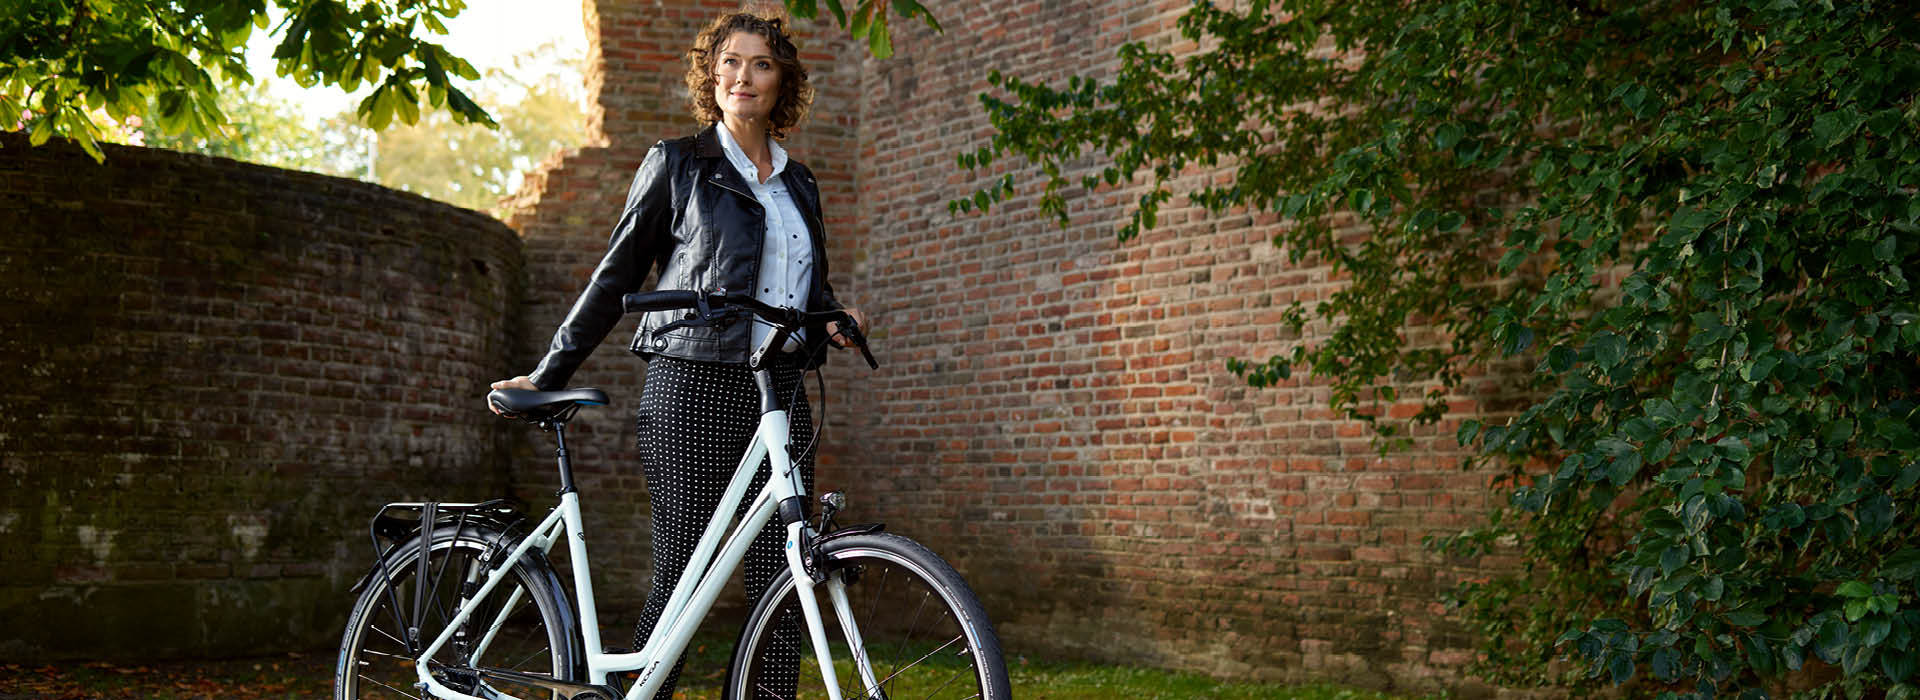 Koga stads- en tourfietsen